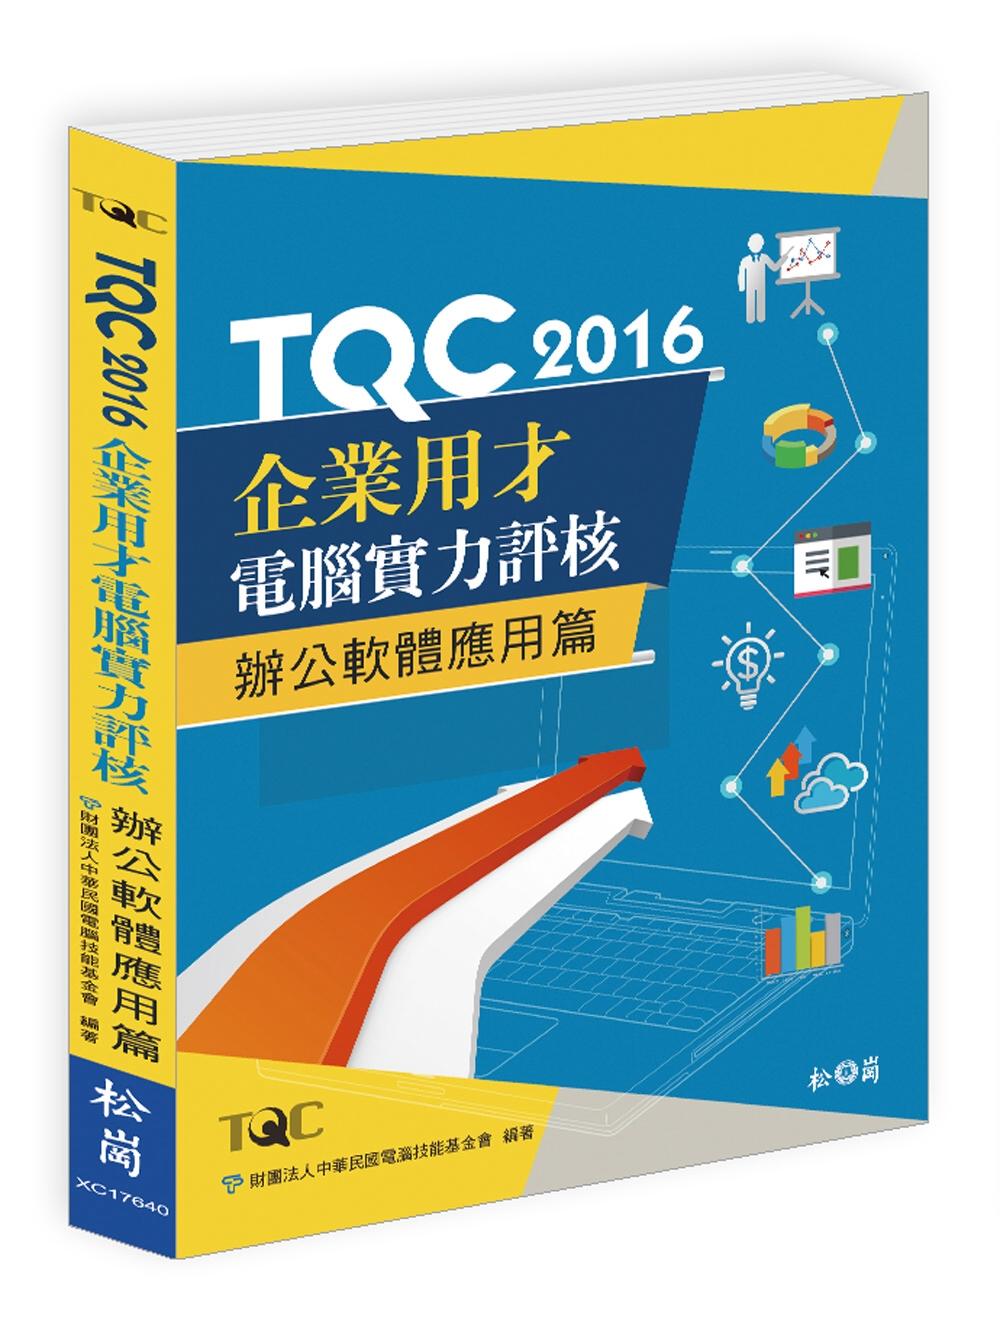 TQC 2016企業用才電腦實力評核:辦公軟體應用篇(附CD)